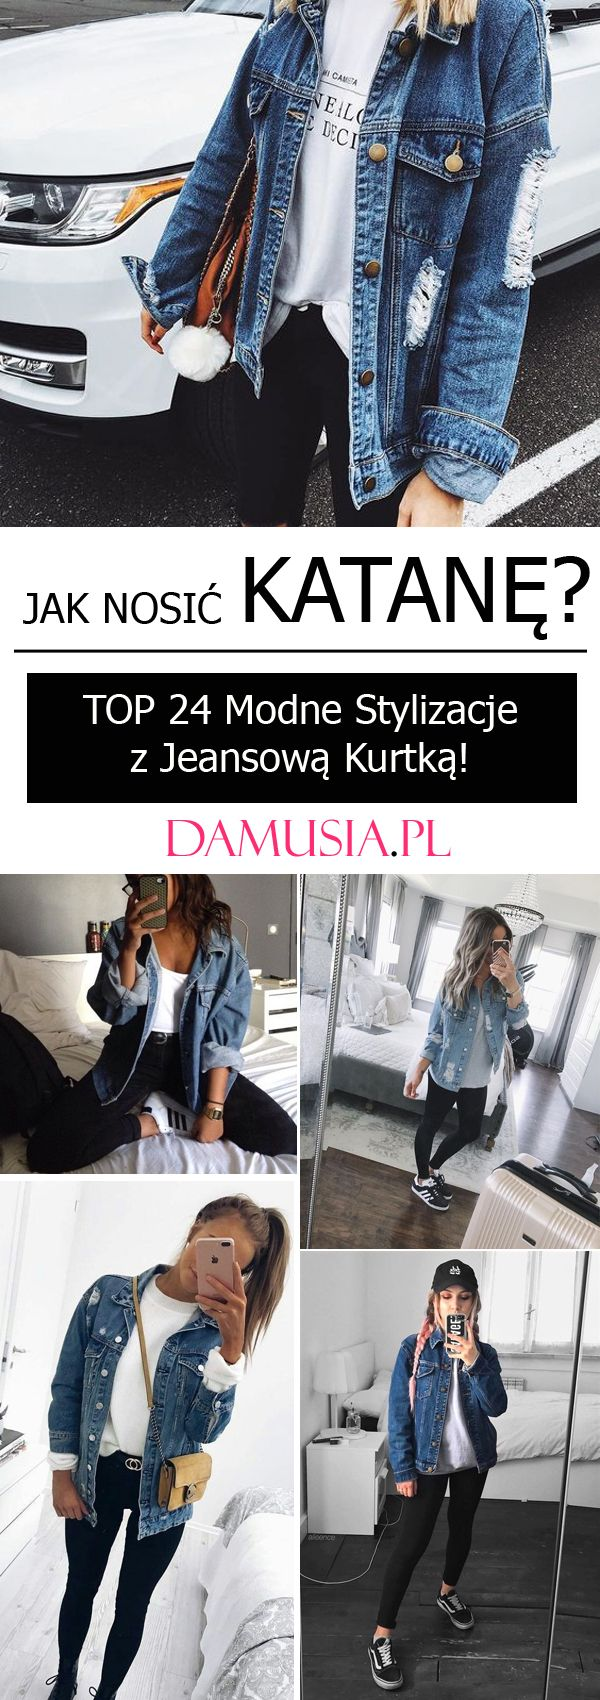 Jak Nosic Katane Top 24 Modne Stylizacje Z Jeansowa Kurtka Fashion Outfits Style